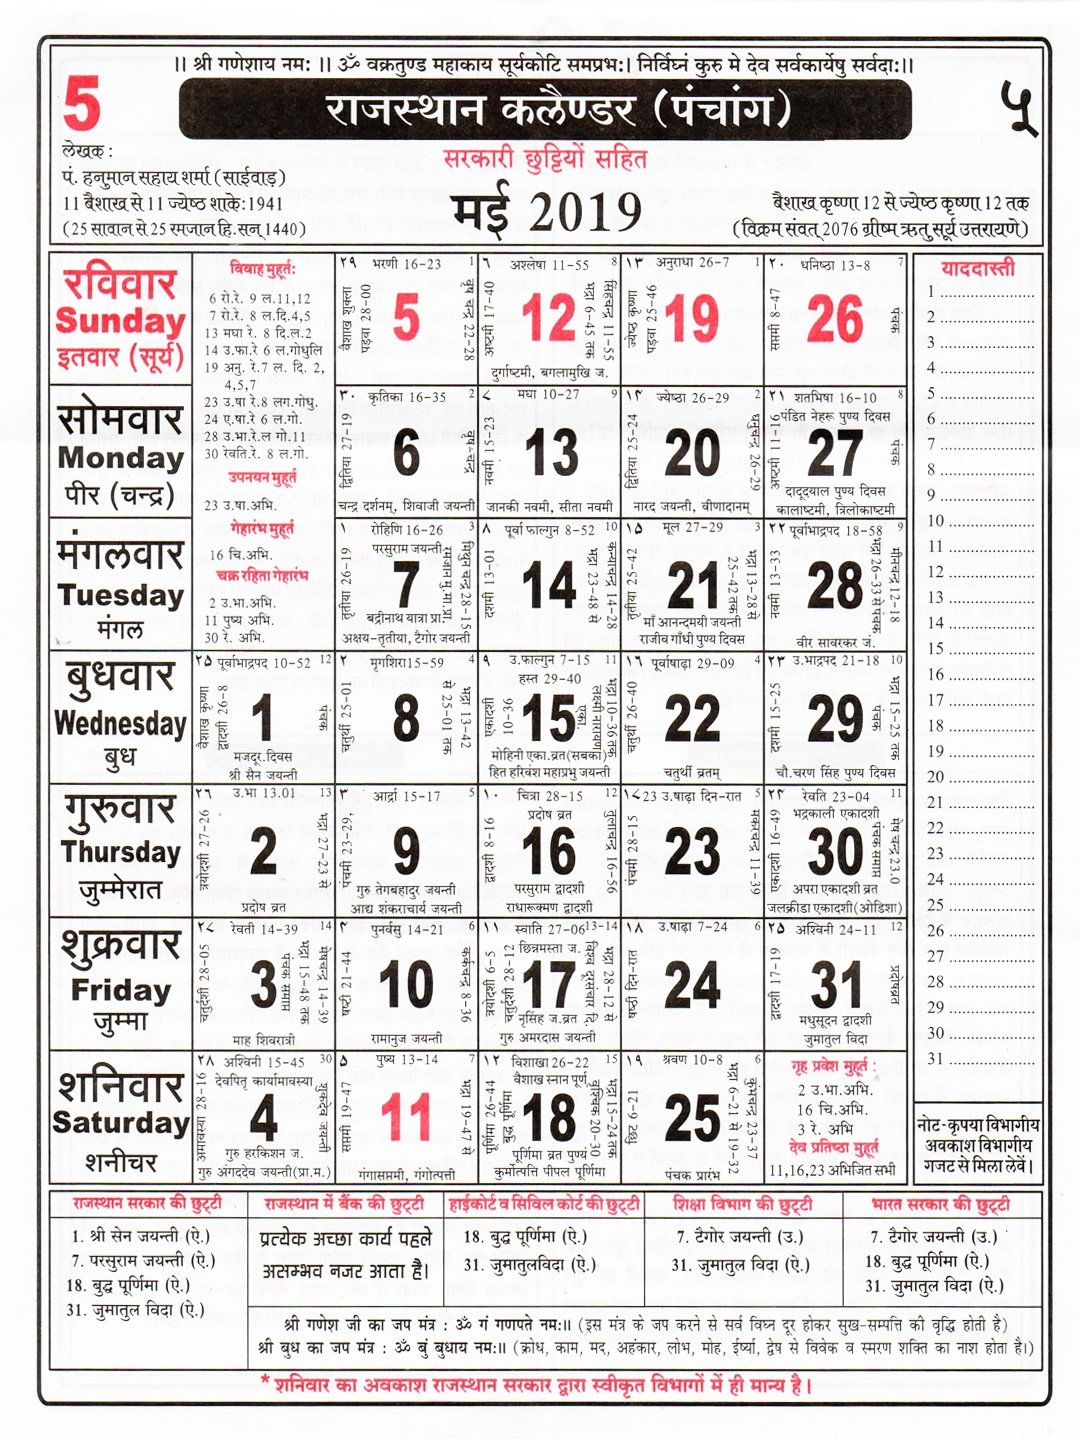 Rajasthan Calendar May 2019   2017Mobilecalendars Calendar 2019 Rajasthan